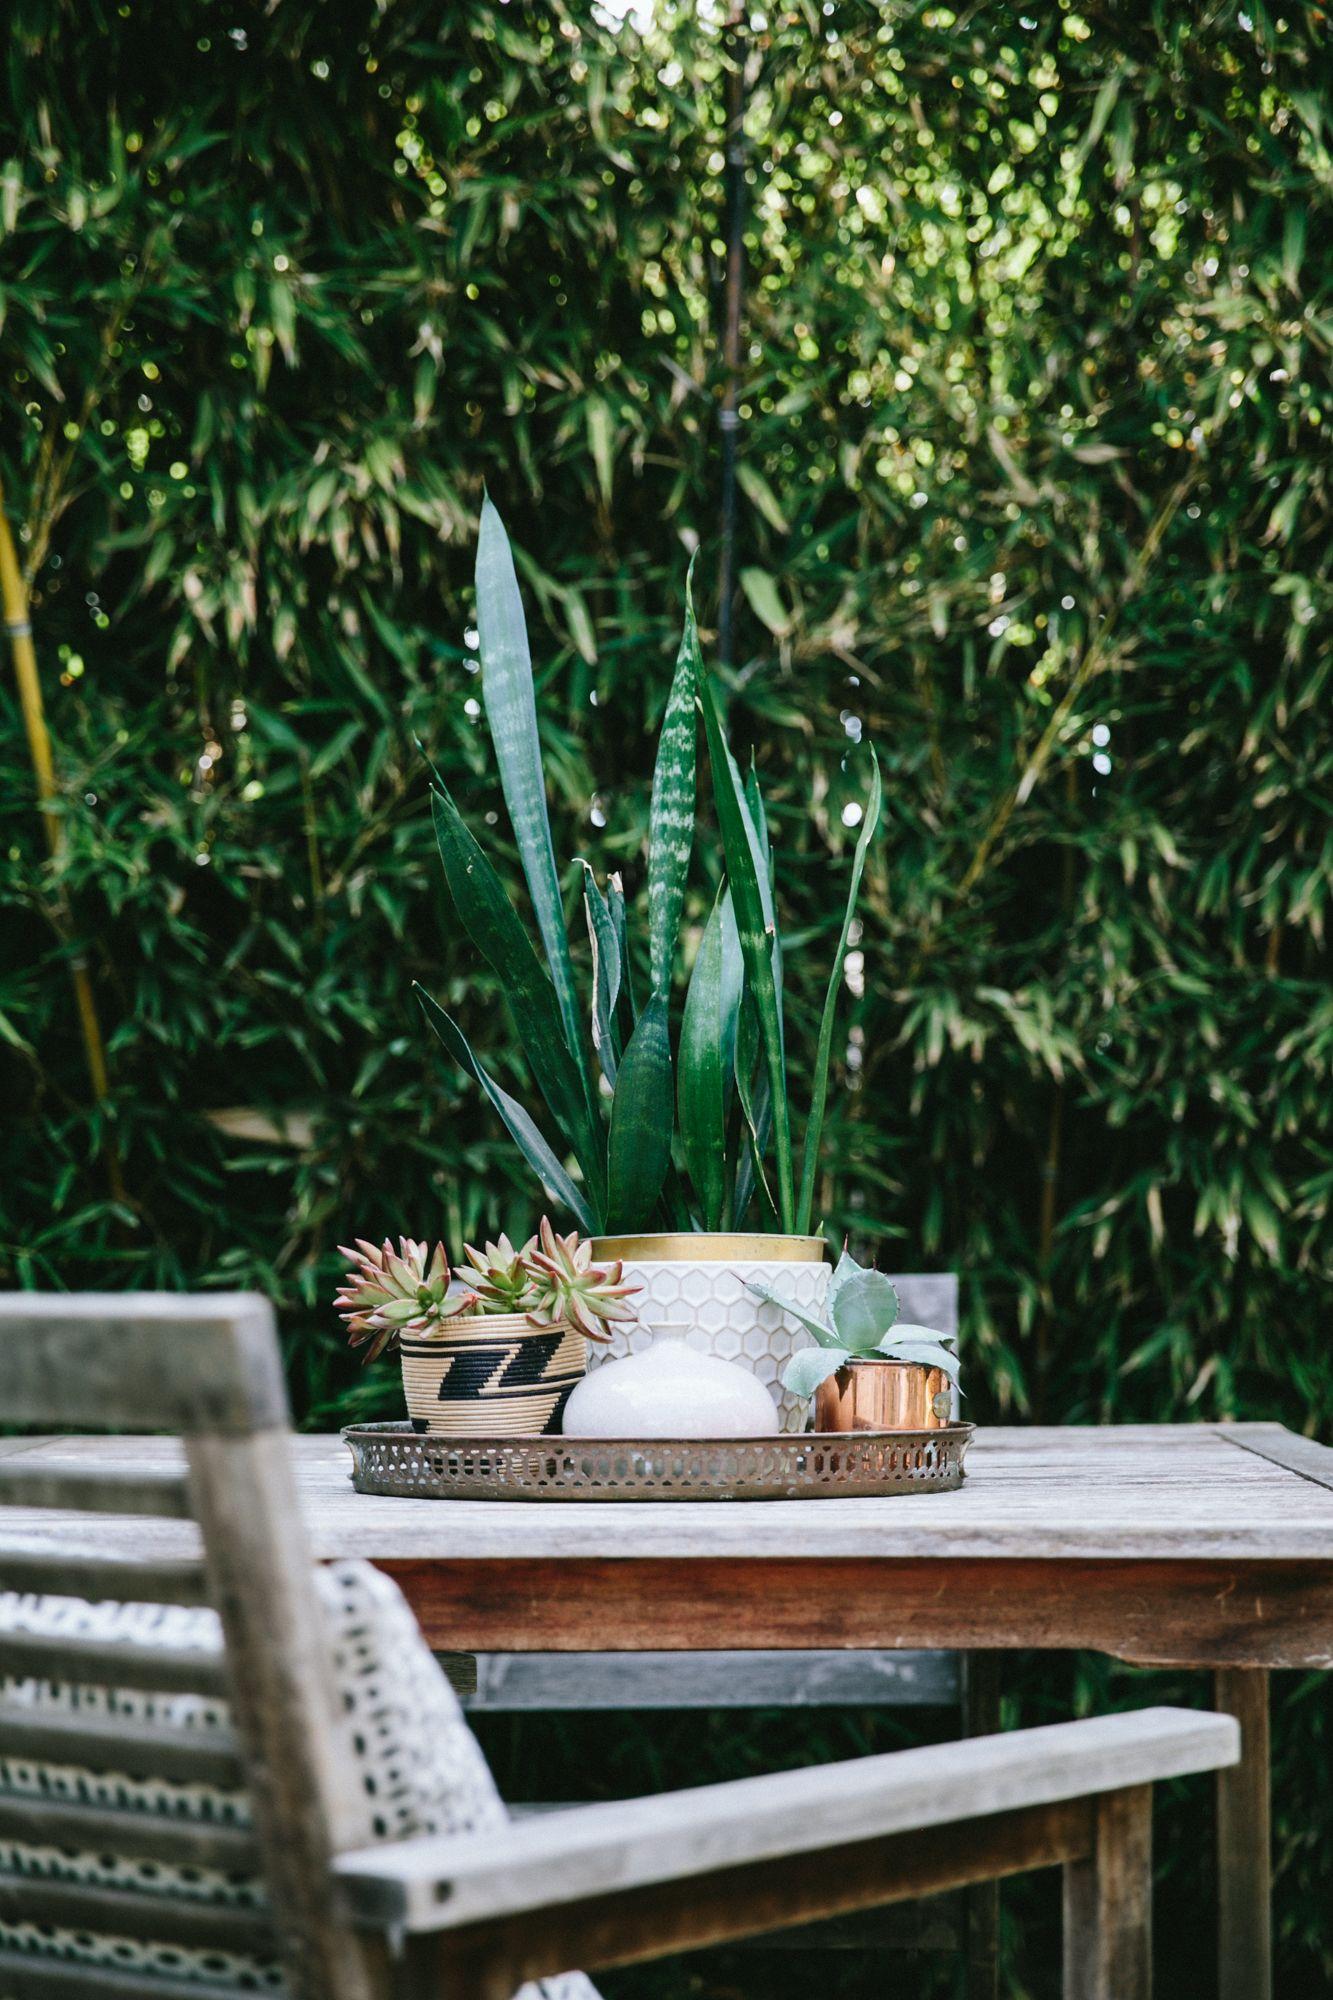 backyard decor | Home | Pinterest | Backyard, Gardens and Patios